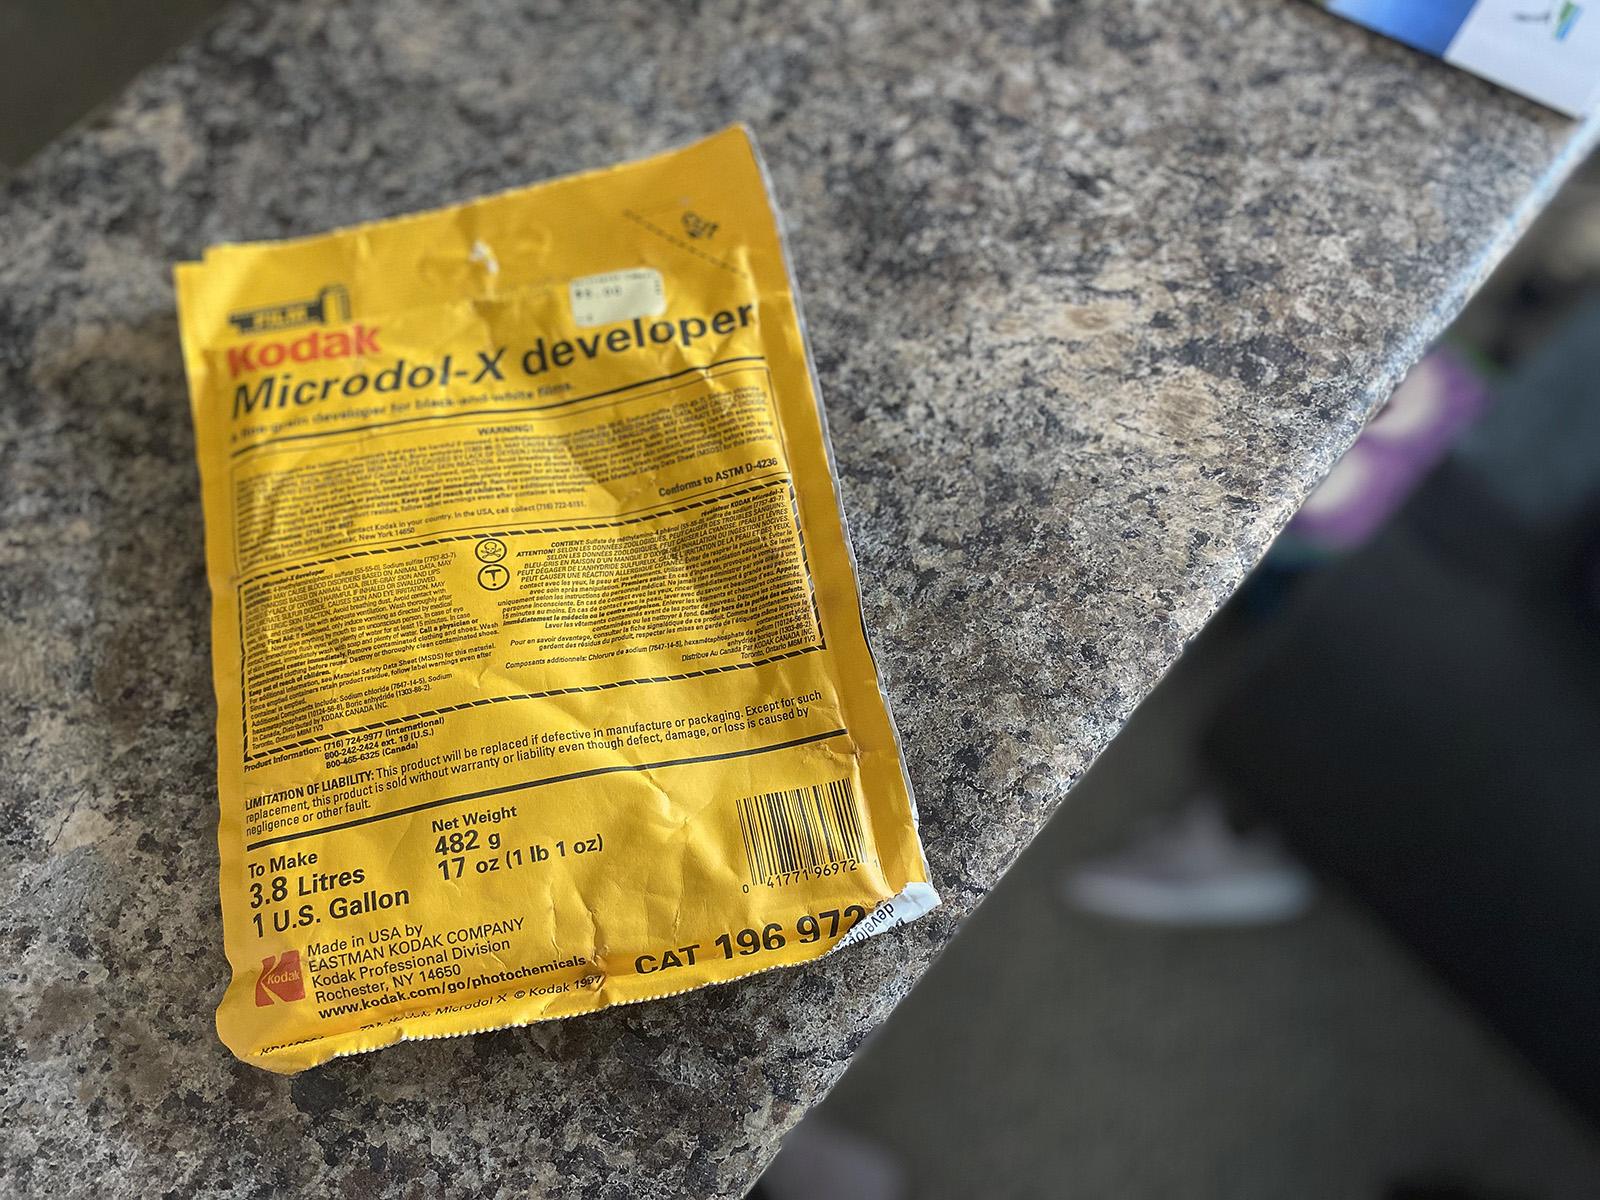 Yellow Pouch of Developer Kodak Microdol X